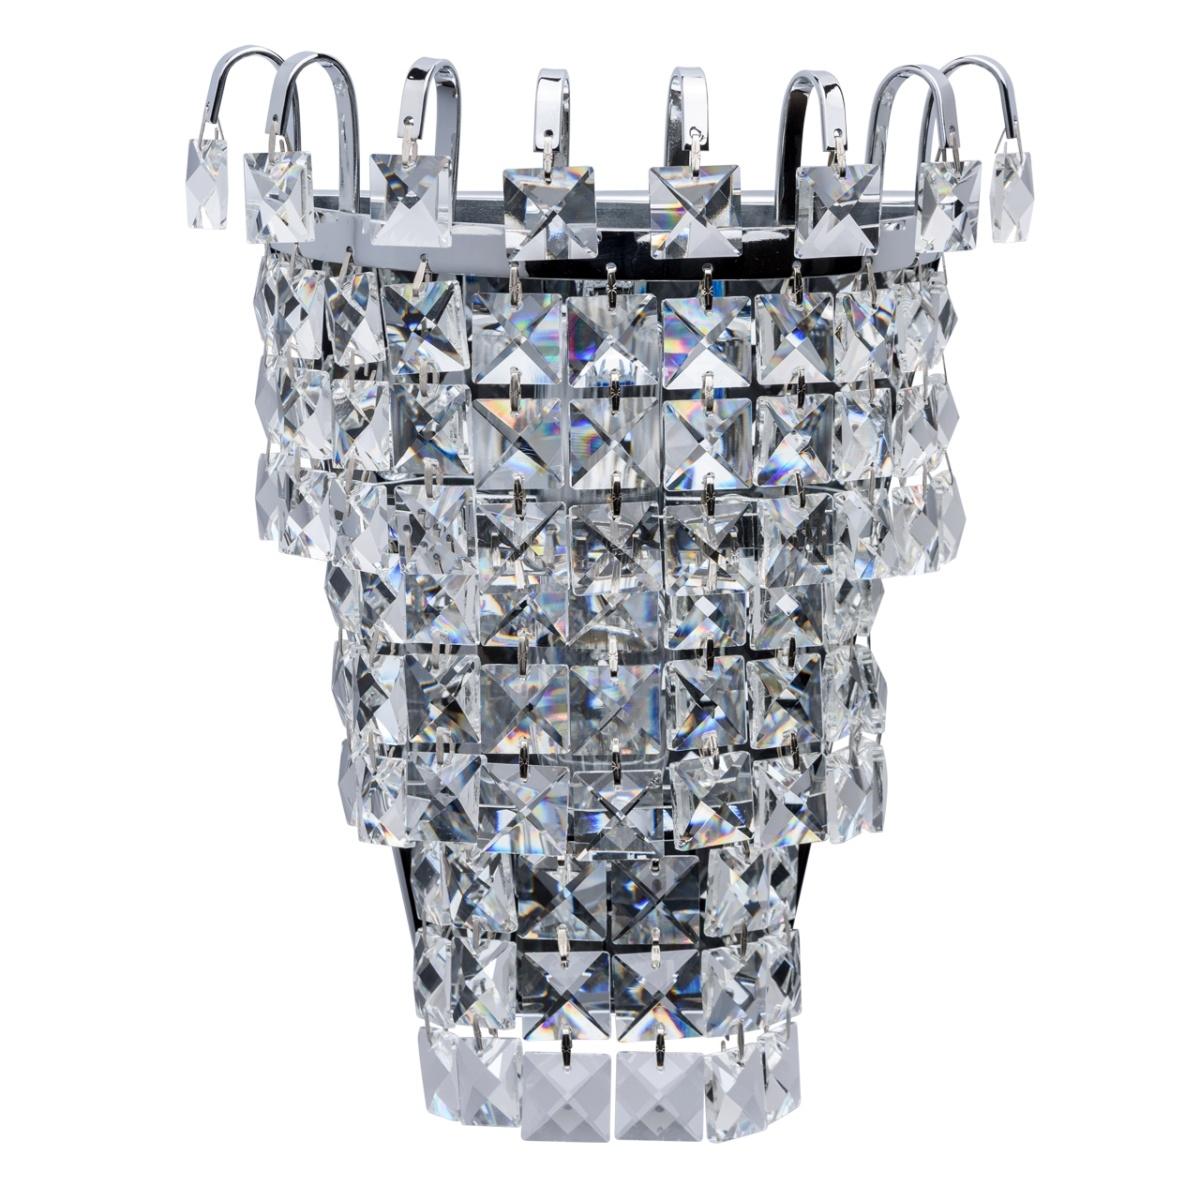 Aplica MW-Light Crystal Adelard 642022801 imagine